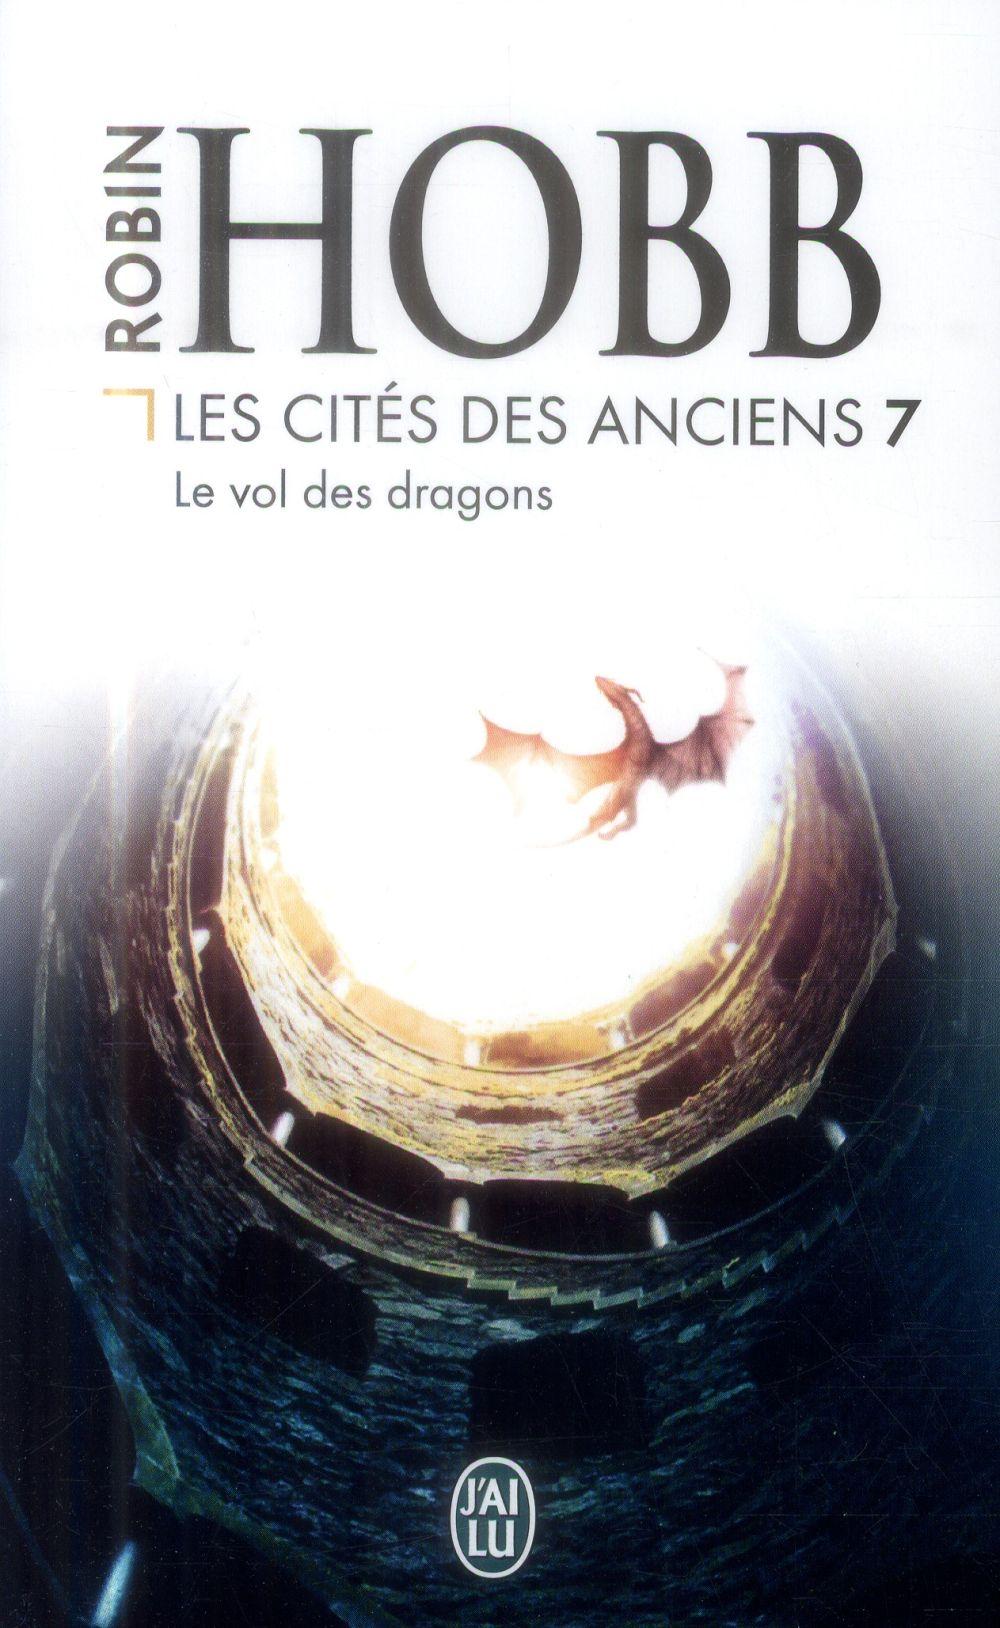 LES CITES DES ANCIENS - 7 - LE VOL DES DRAGONS